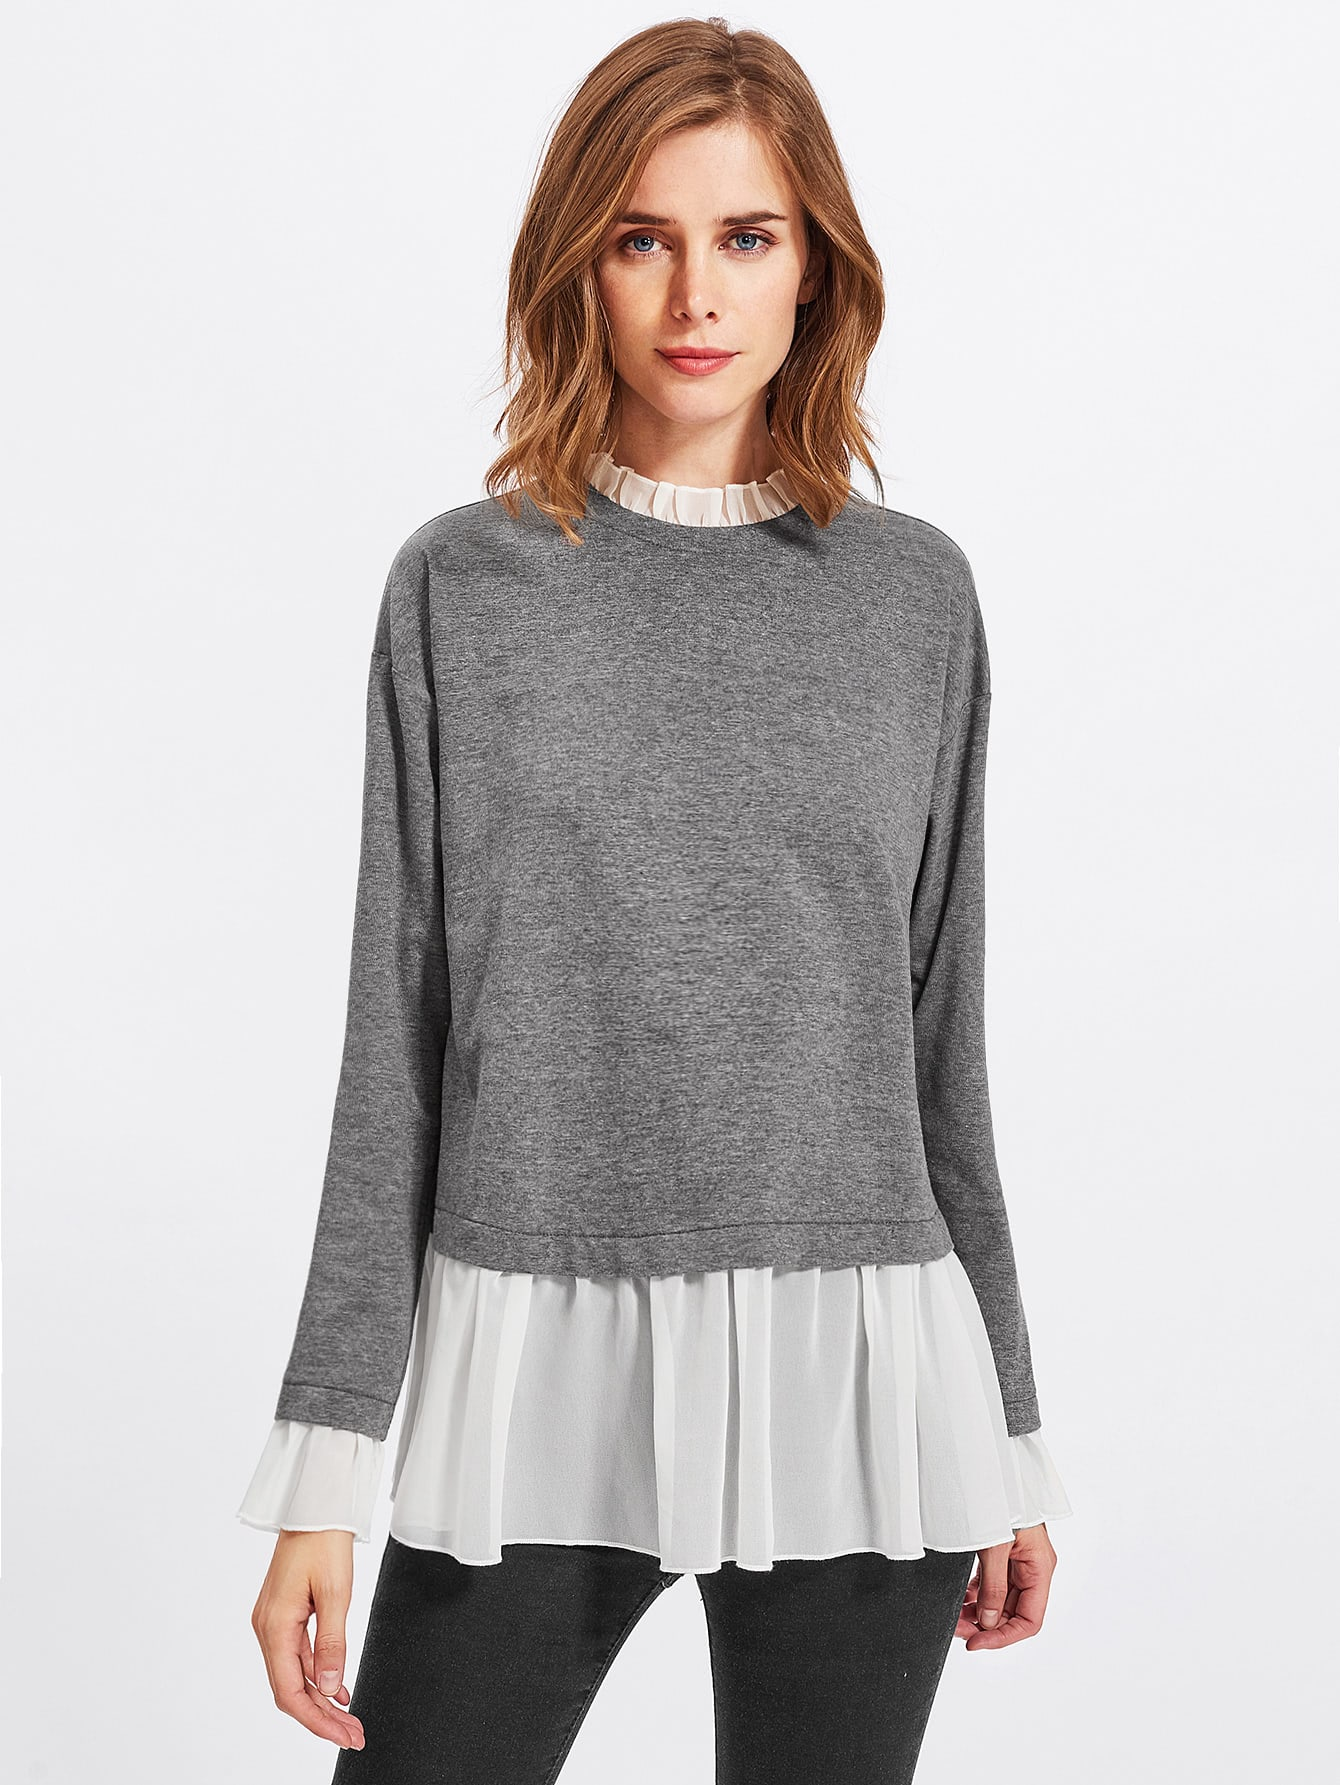 Contrast Ruffle Trim Heather Knit Sweatshirt все цены